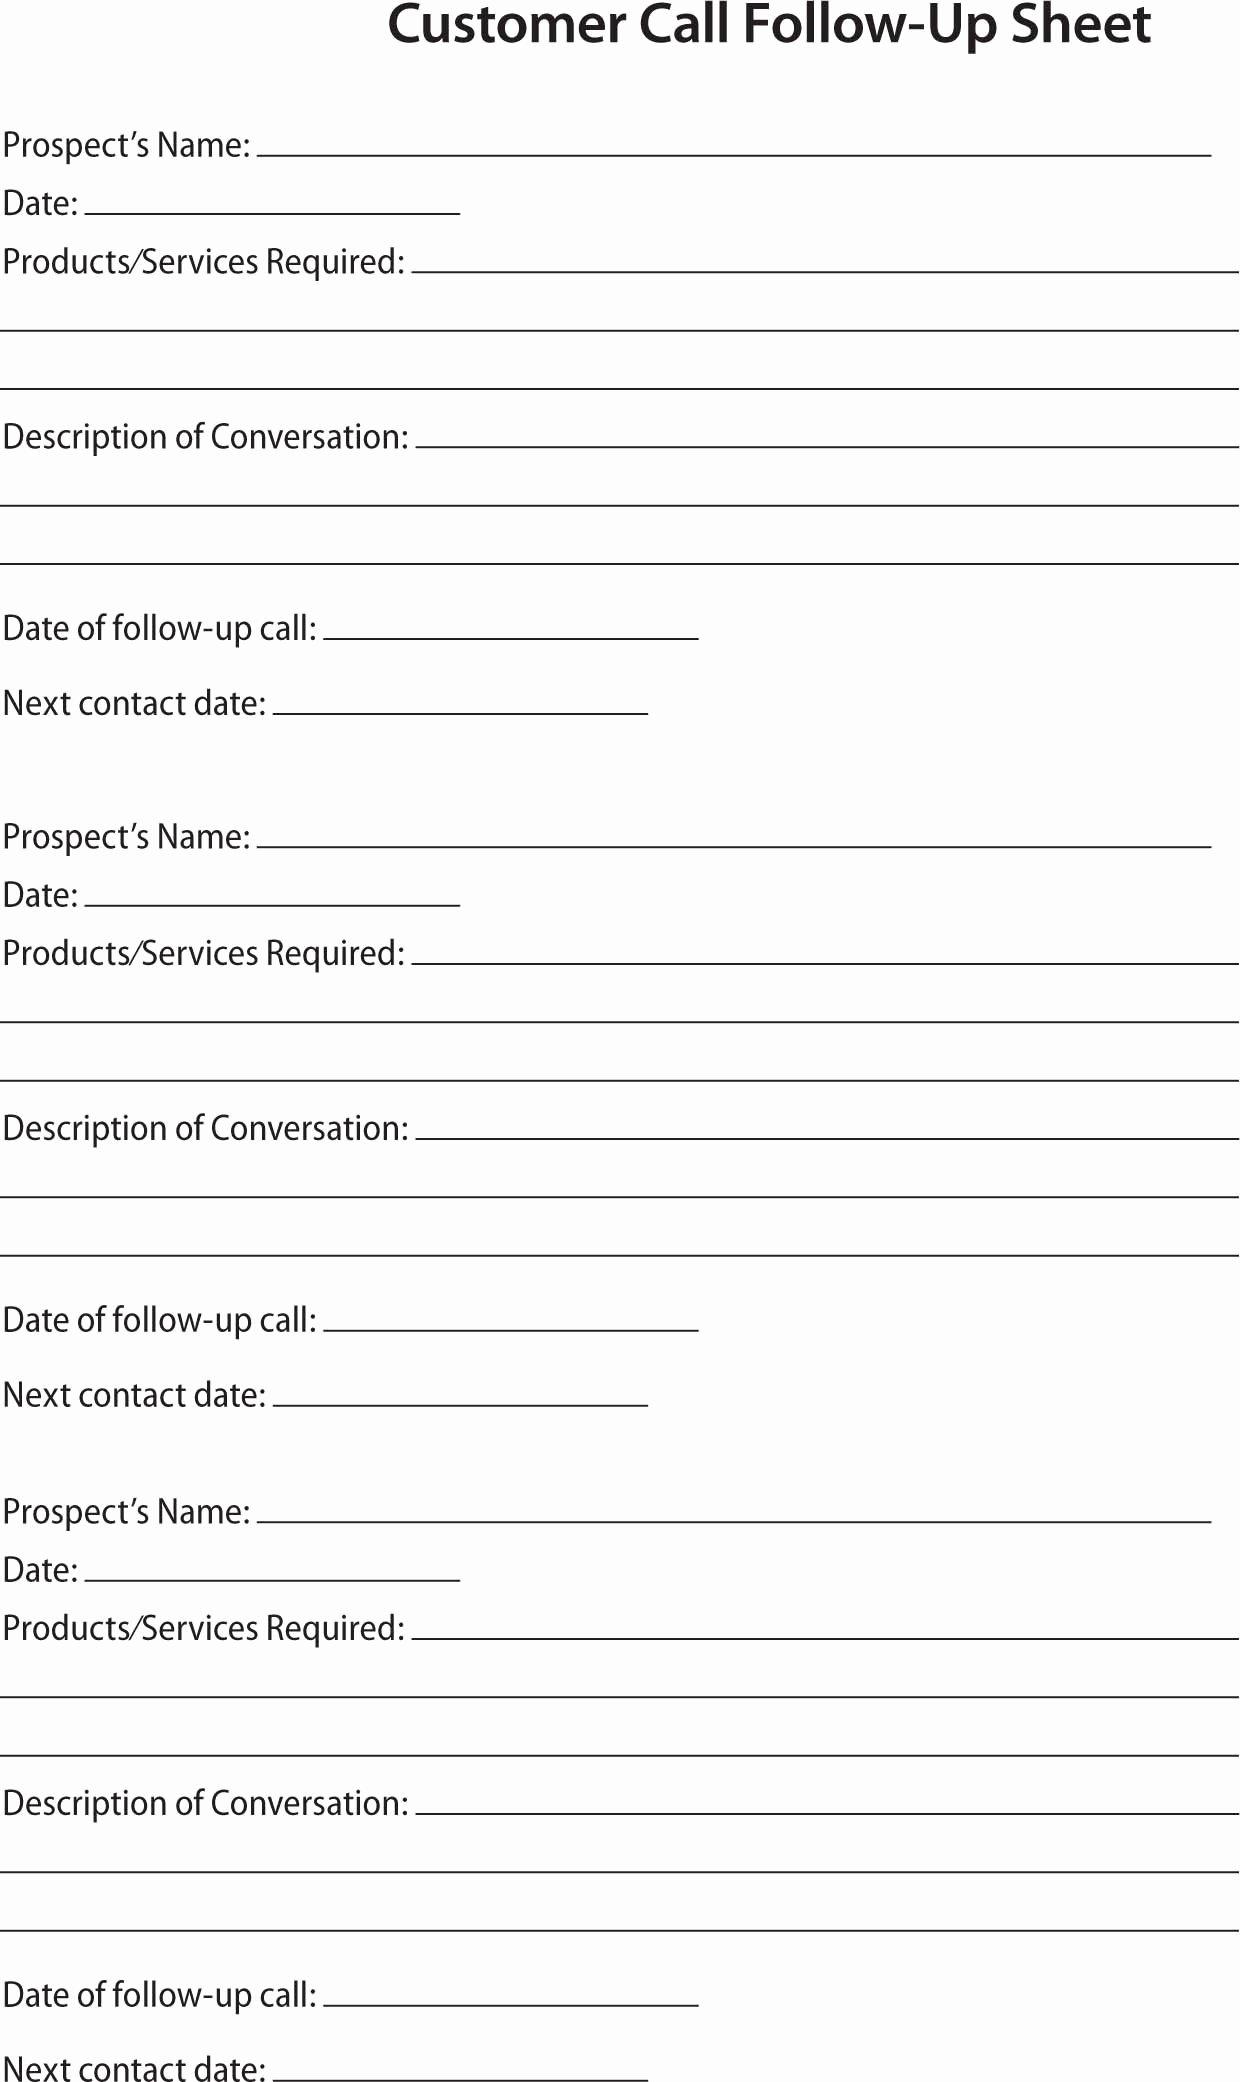 Client Contact form Lovely 80 20 Prospect Sheet Customer Call Follow Up